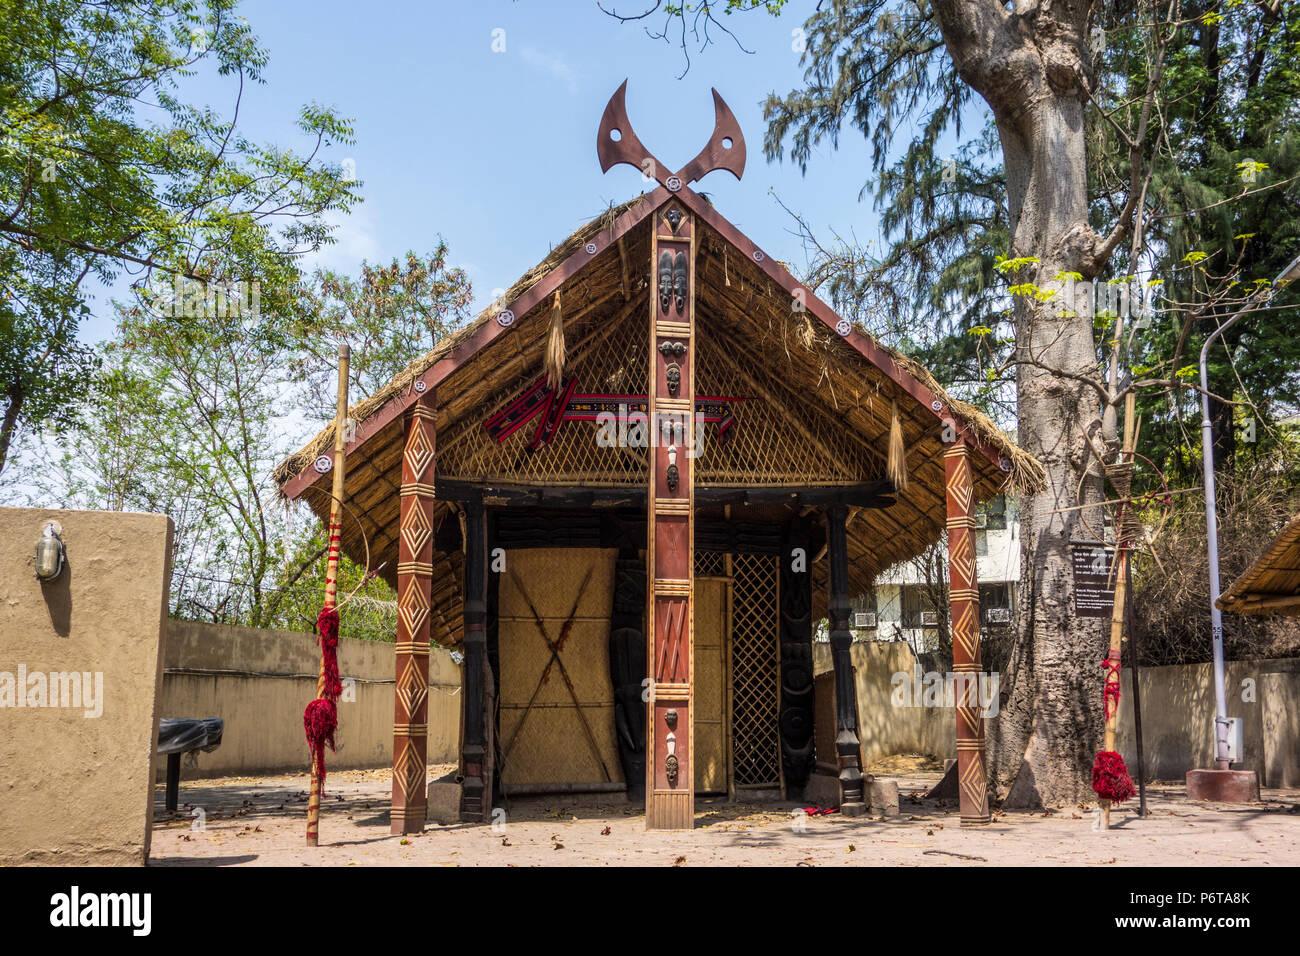 Konyak Morung or traditional Men's House for the men of Konyak Tribe in Nagaland, National Handicrafts and Handlooms Museum, New Delhi, Delhi, India - Stock Image